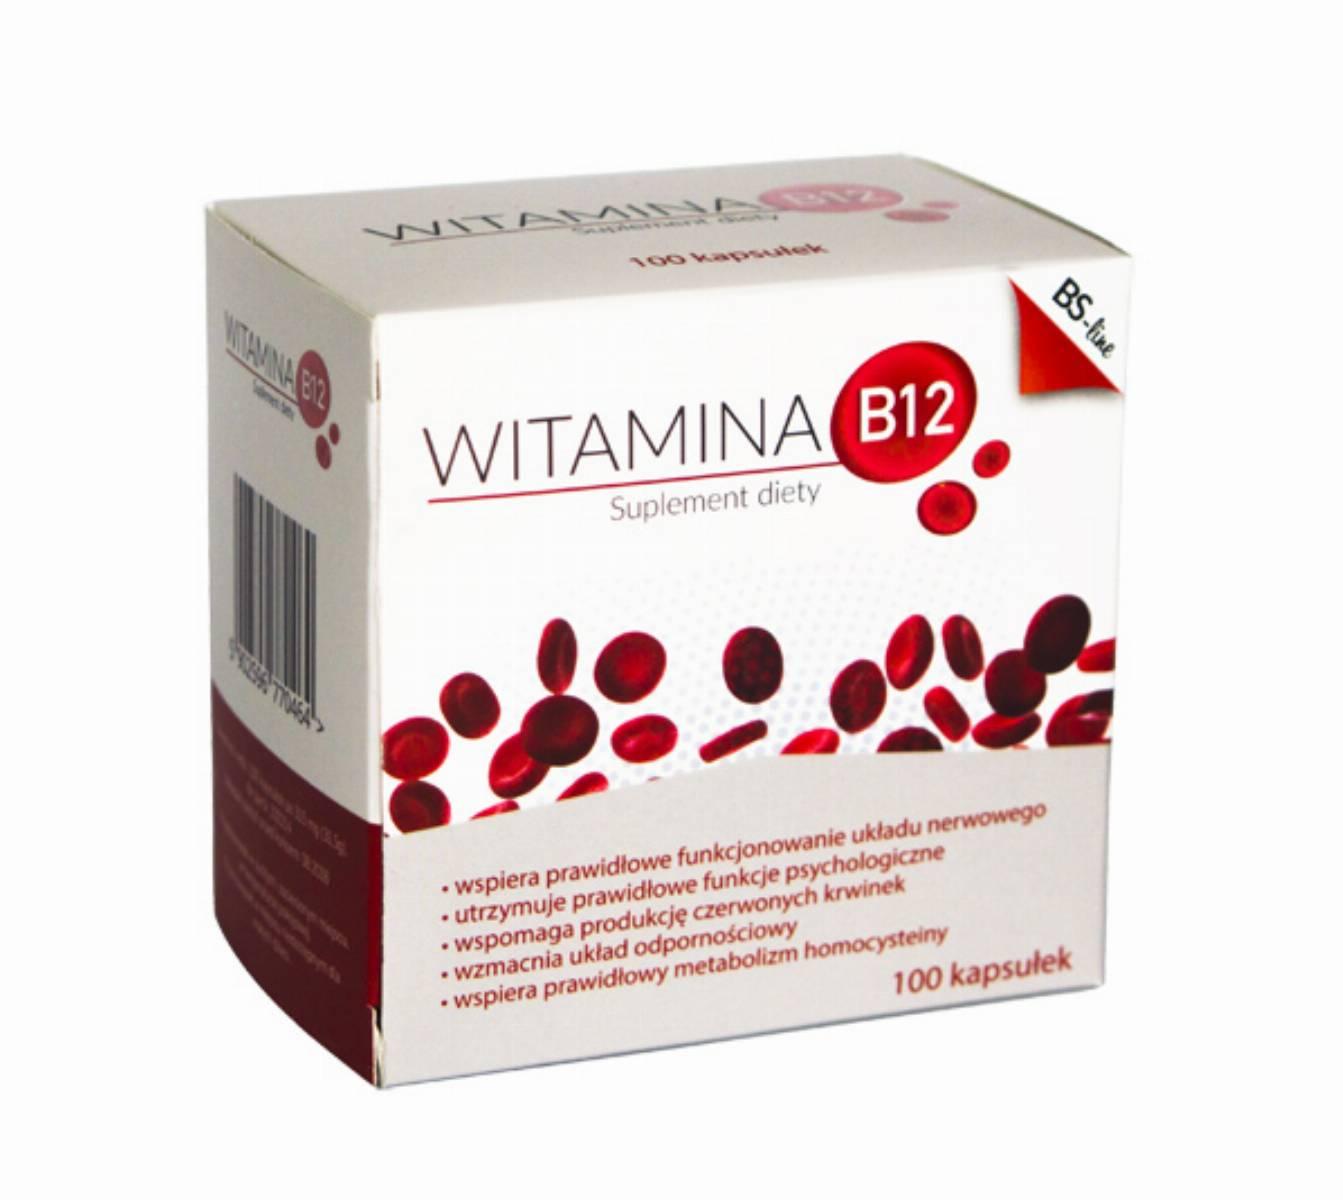 witamina_B12_suplement-diety